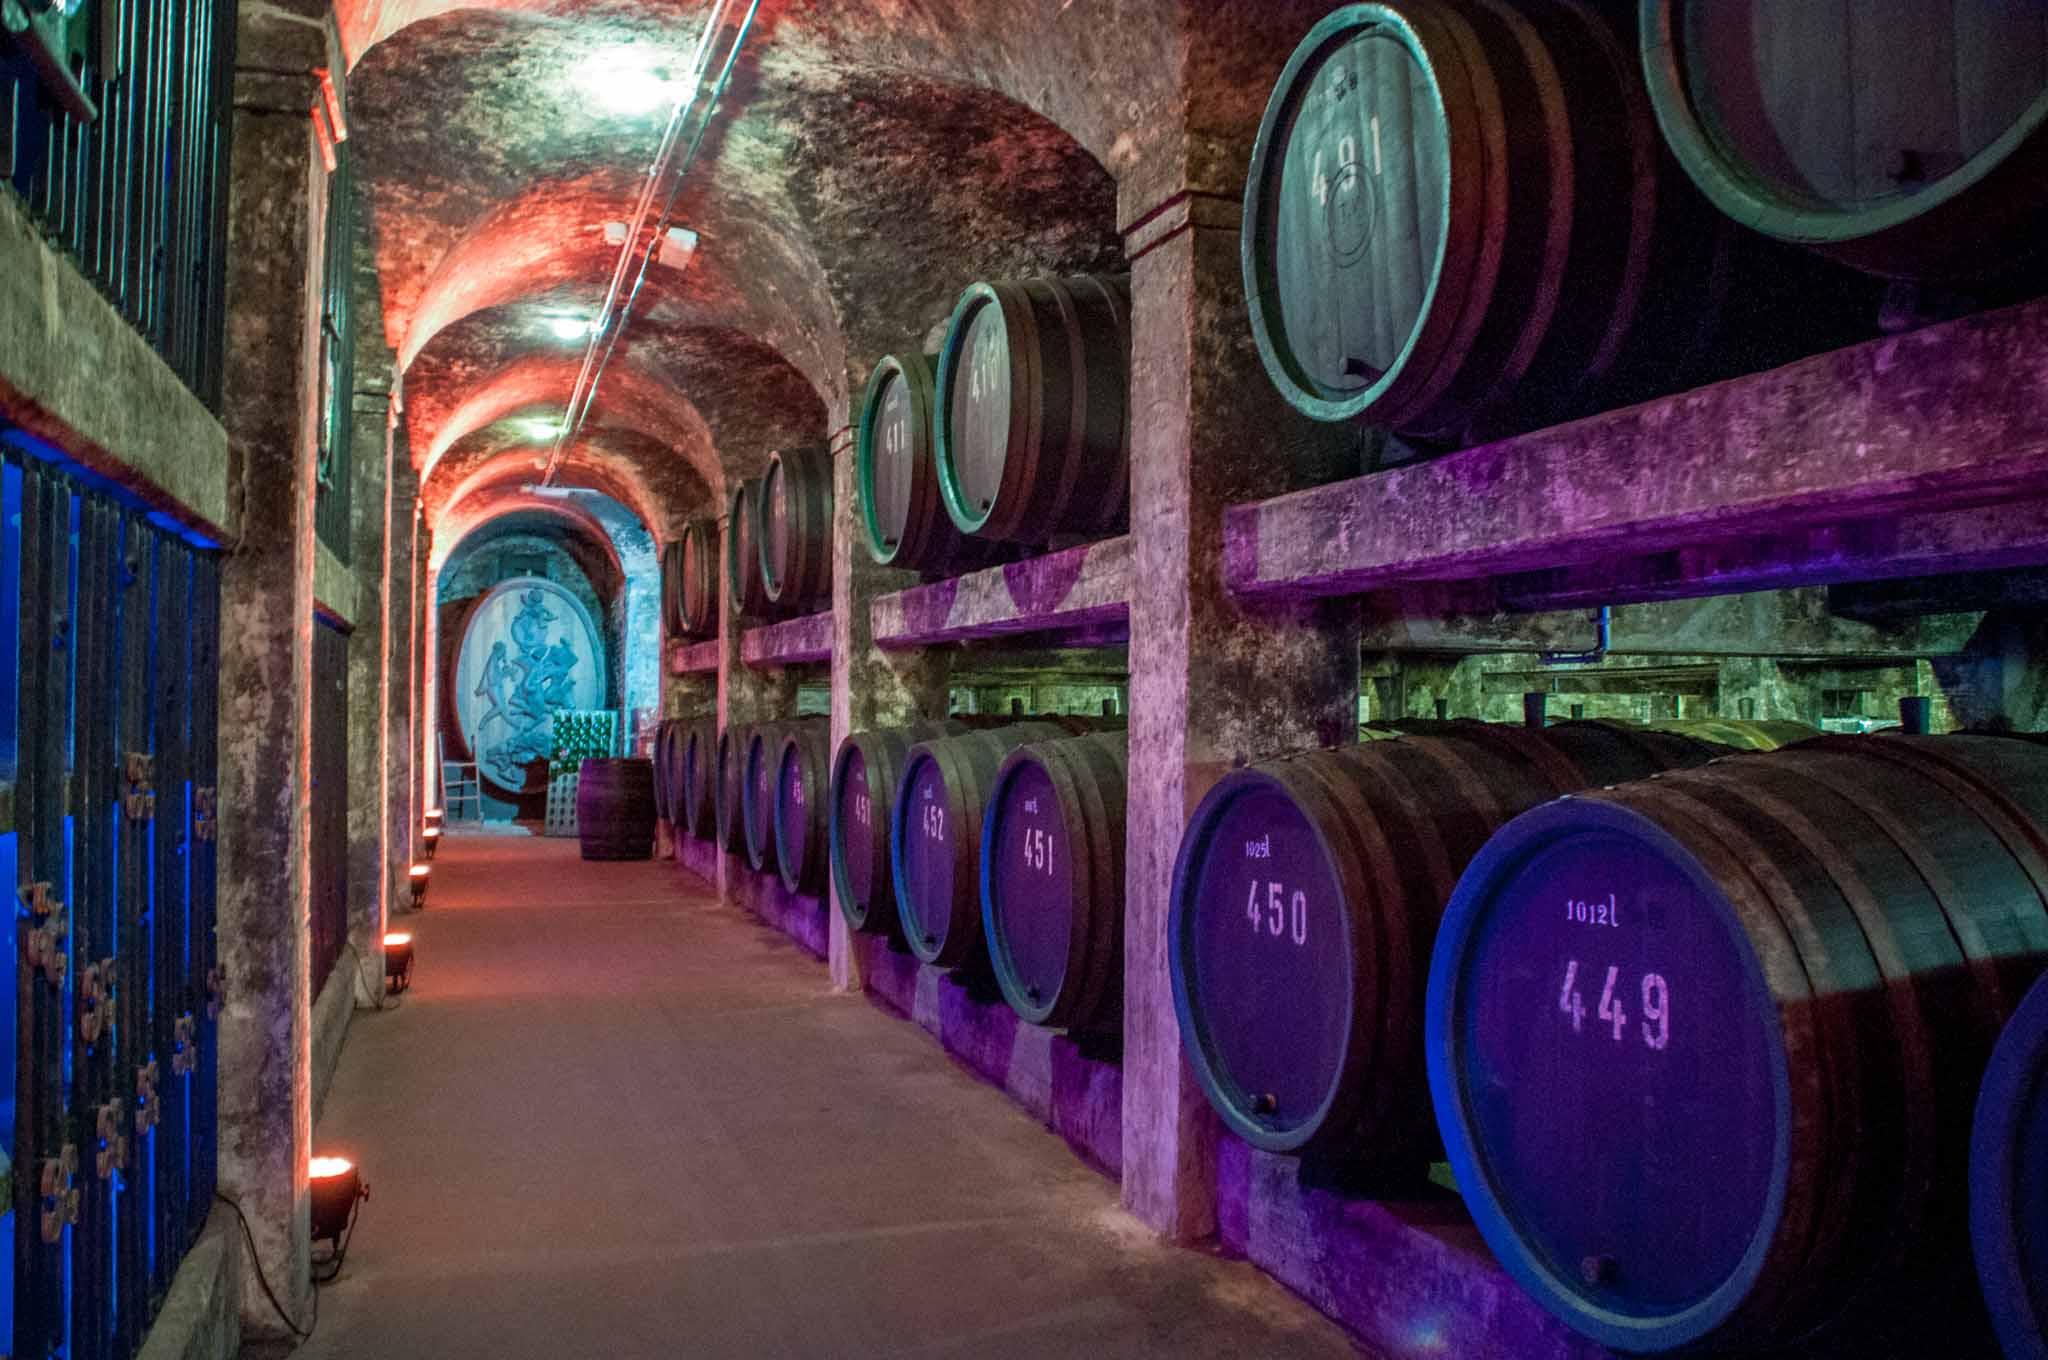 Barrels in the wine cellar underneath Bremen Town Hall